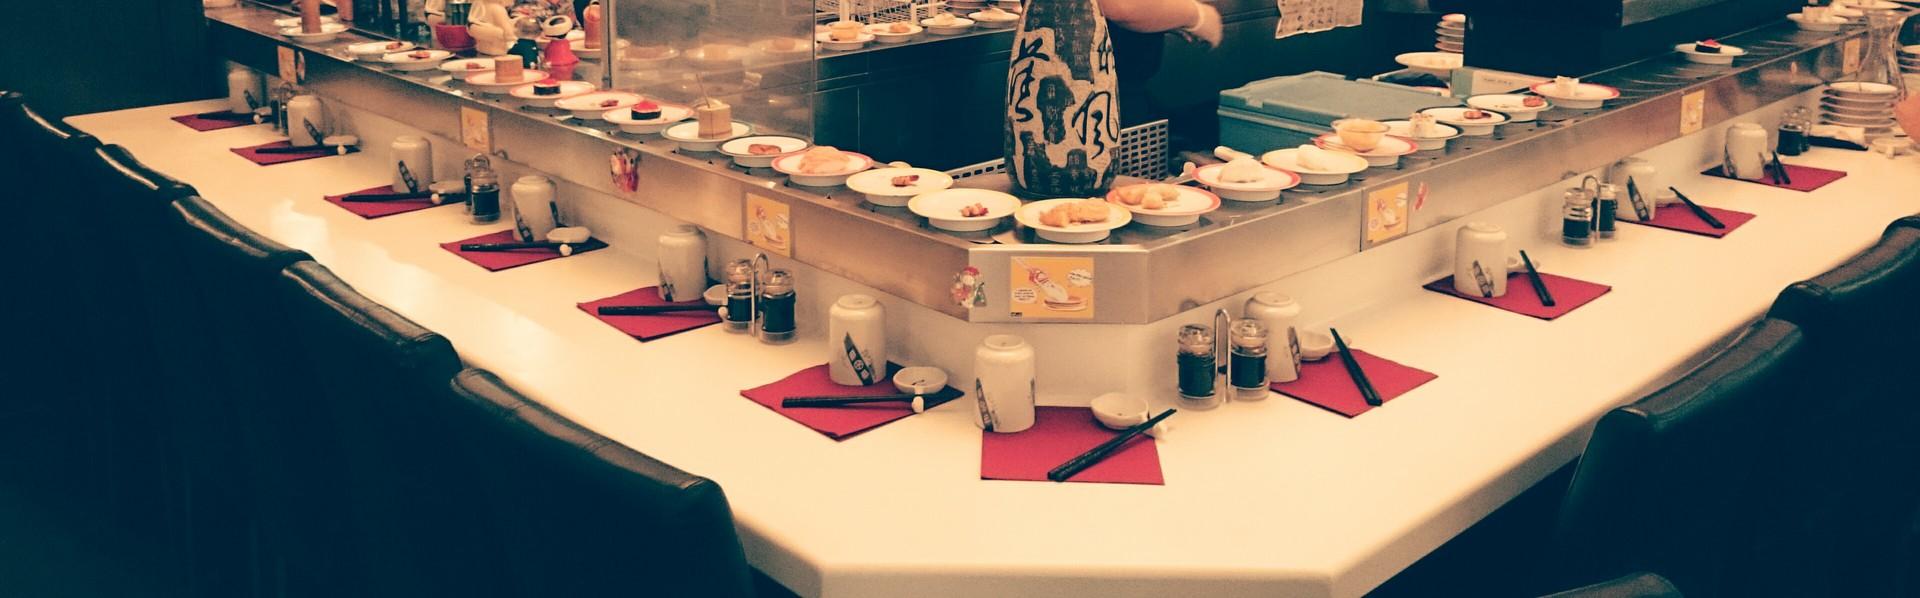 lyon-considerada-capital-gastronomica-fr